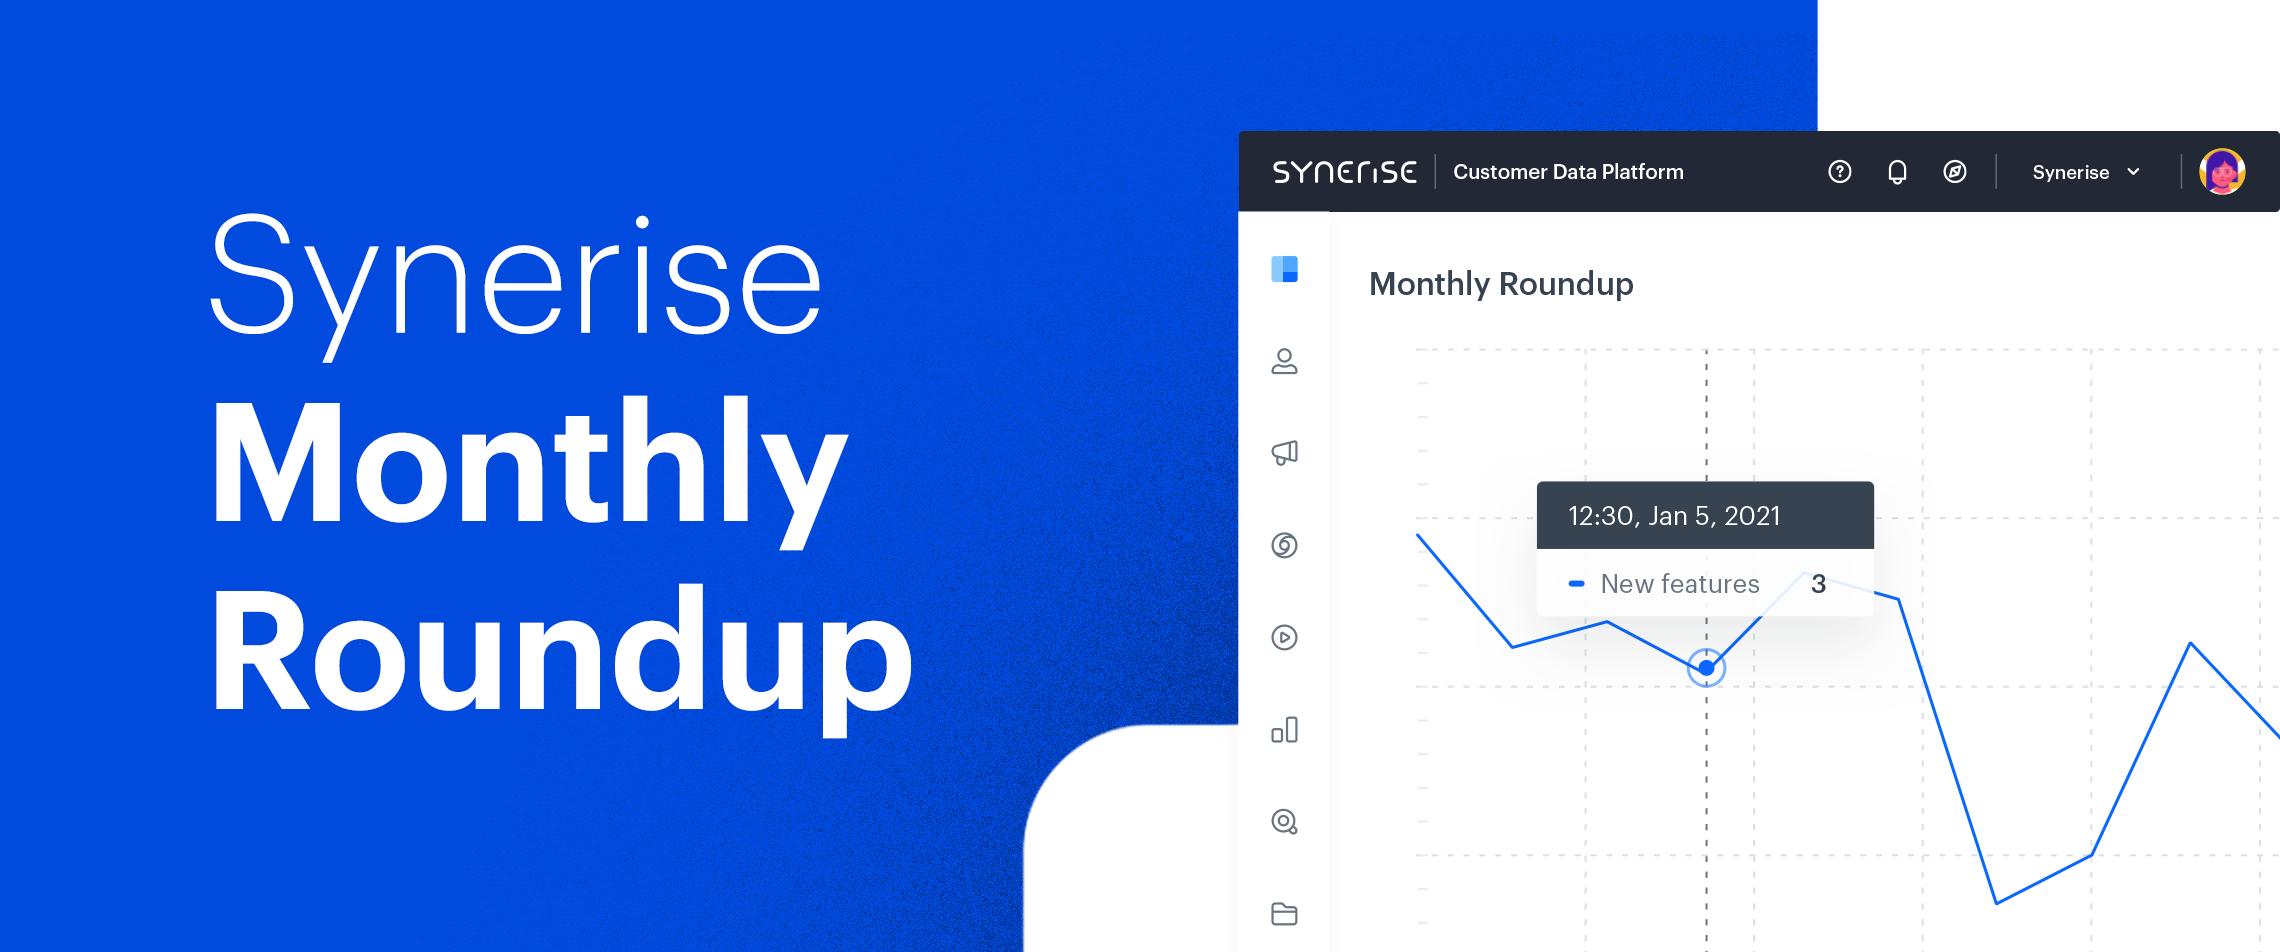 2nd quarter of 2021 -  Synerise Roundup